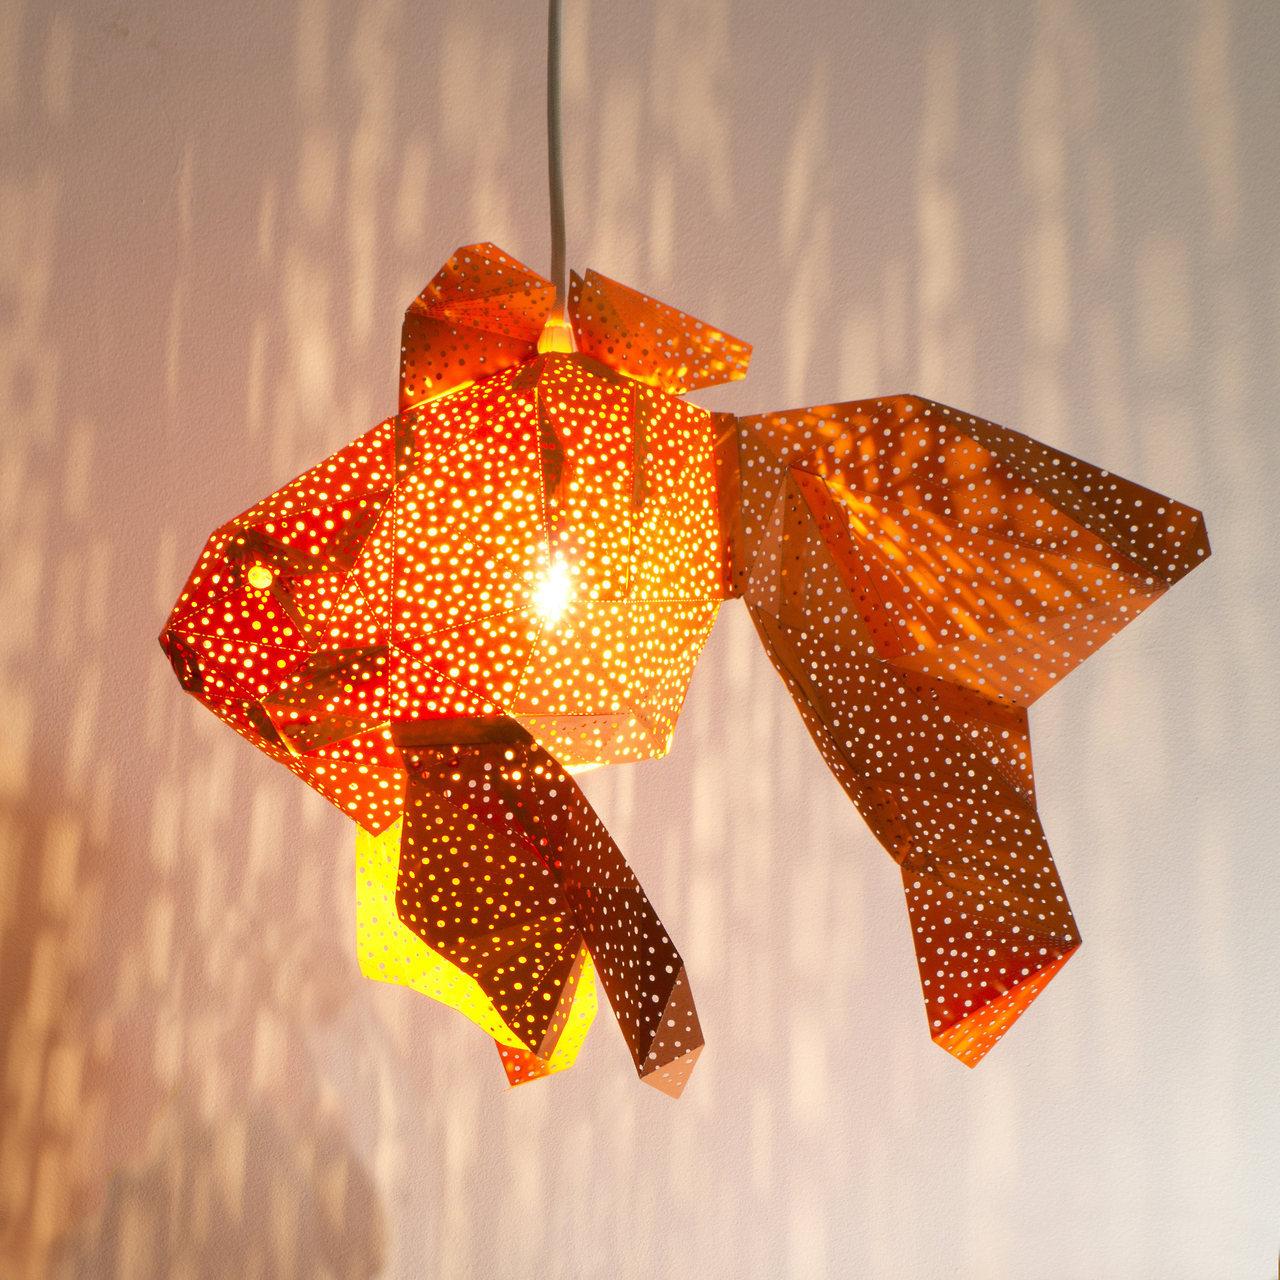 Papercraft light shades of aquatic life by Vasili